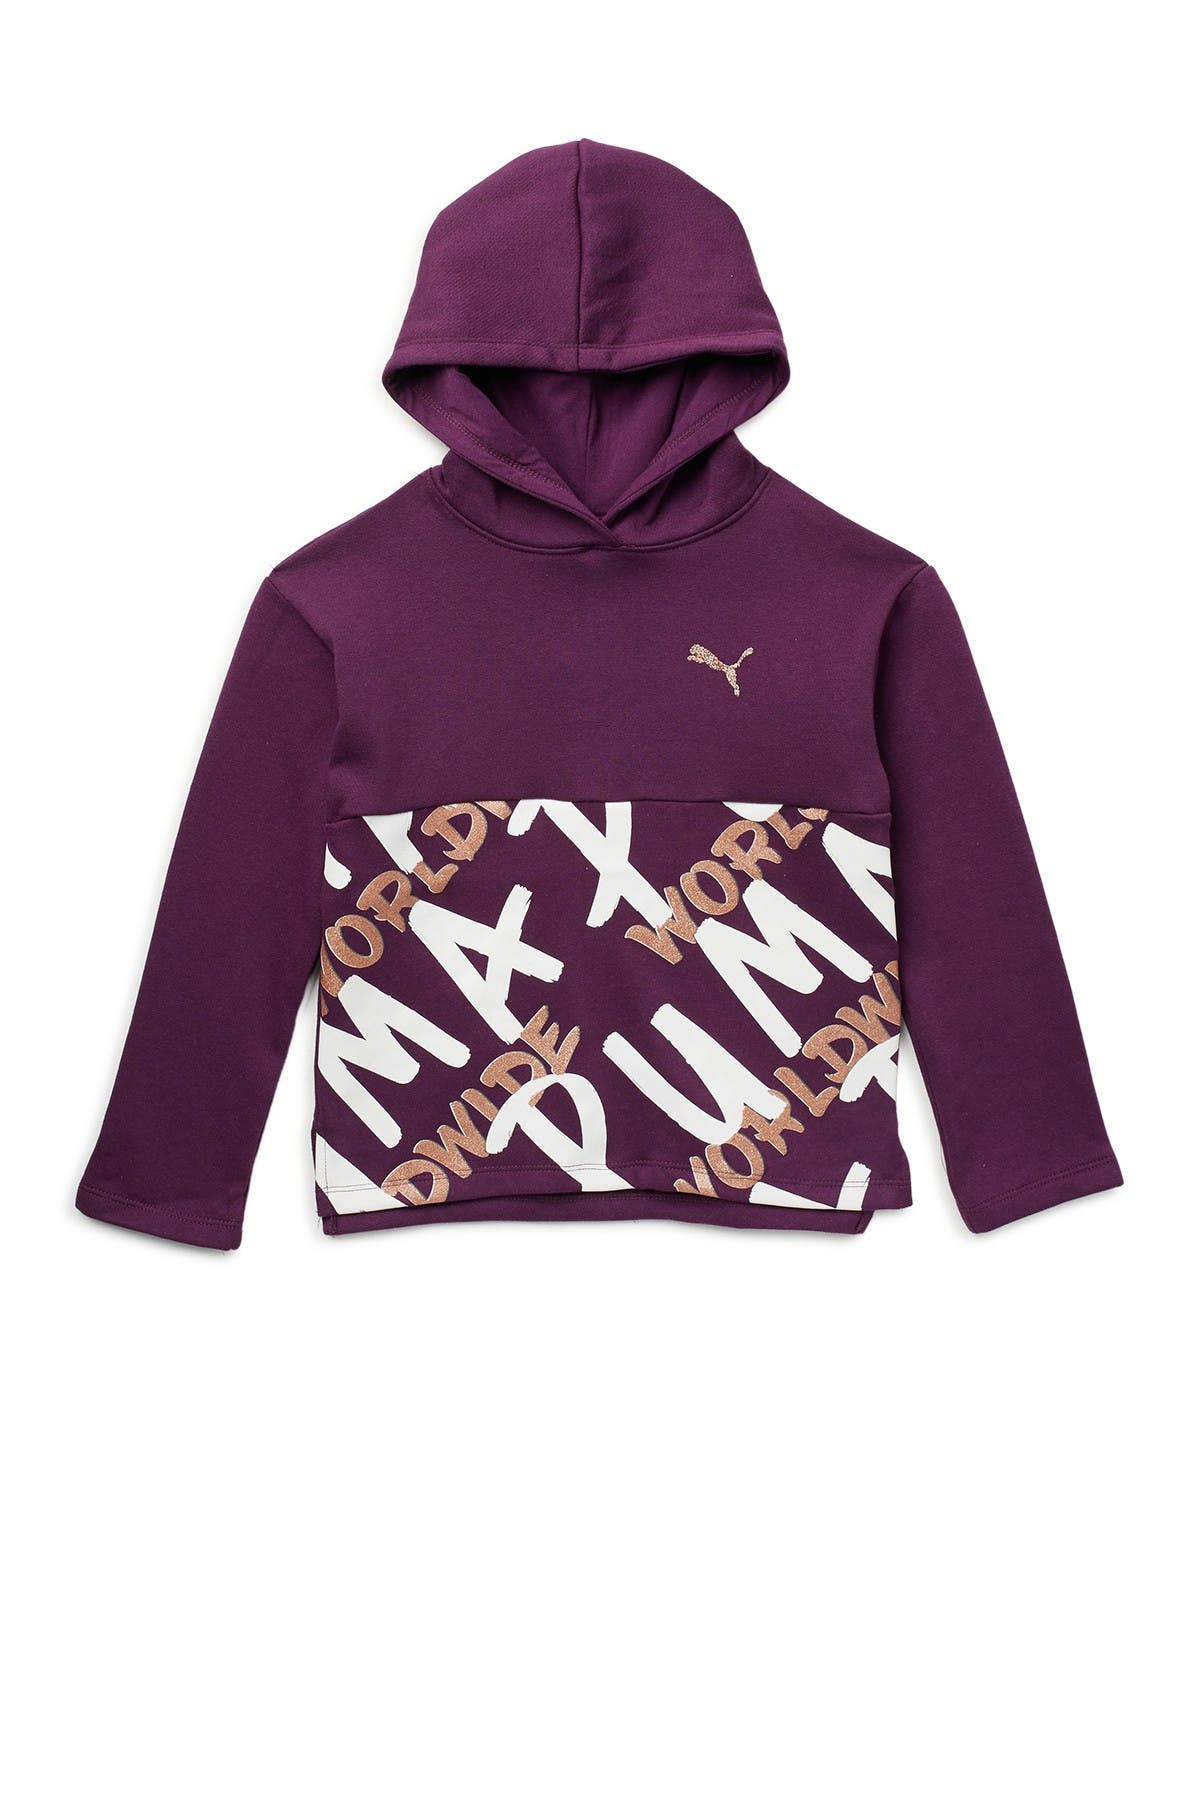 Image of PUMA Tag Pack Fleece Pullover Hoodie